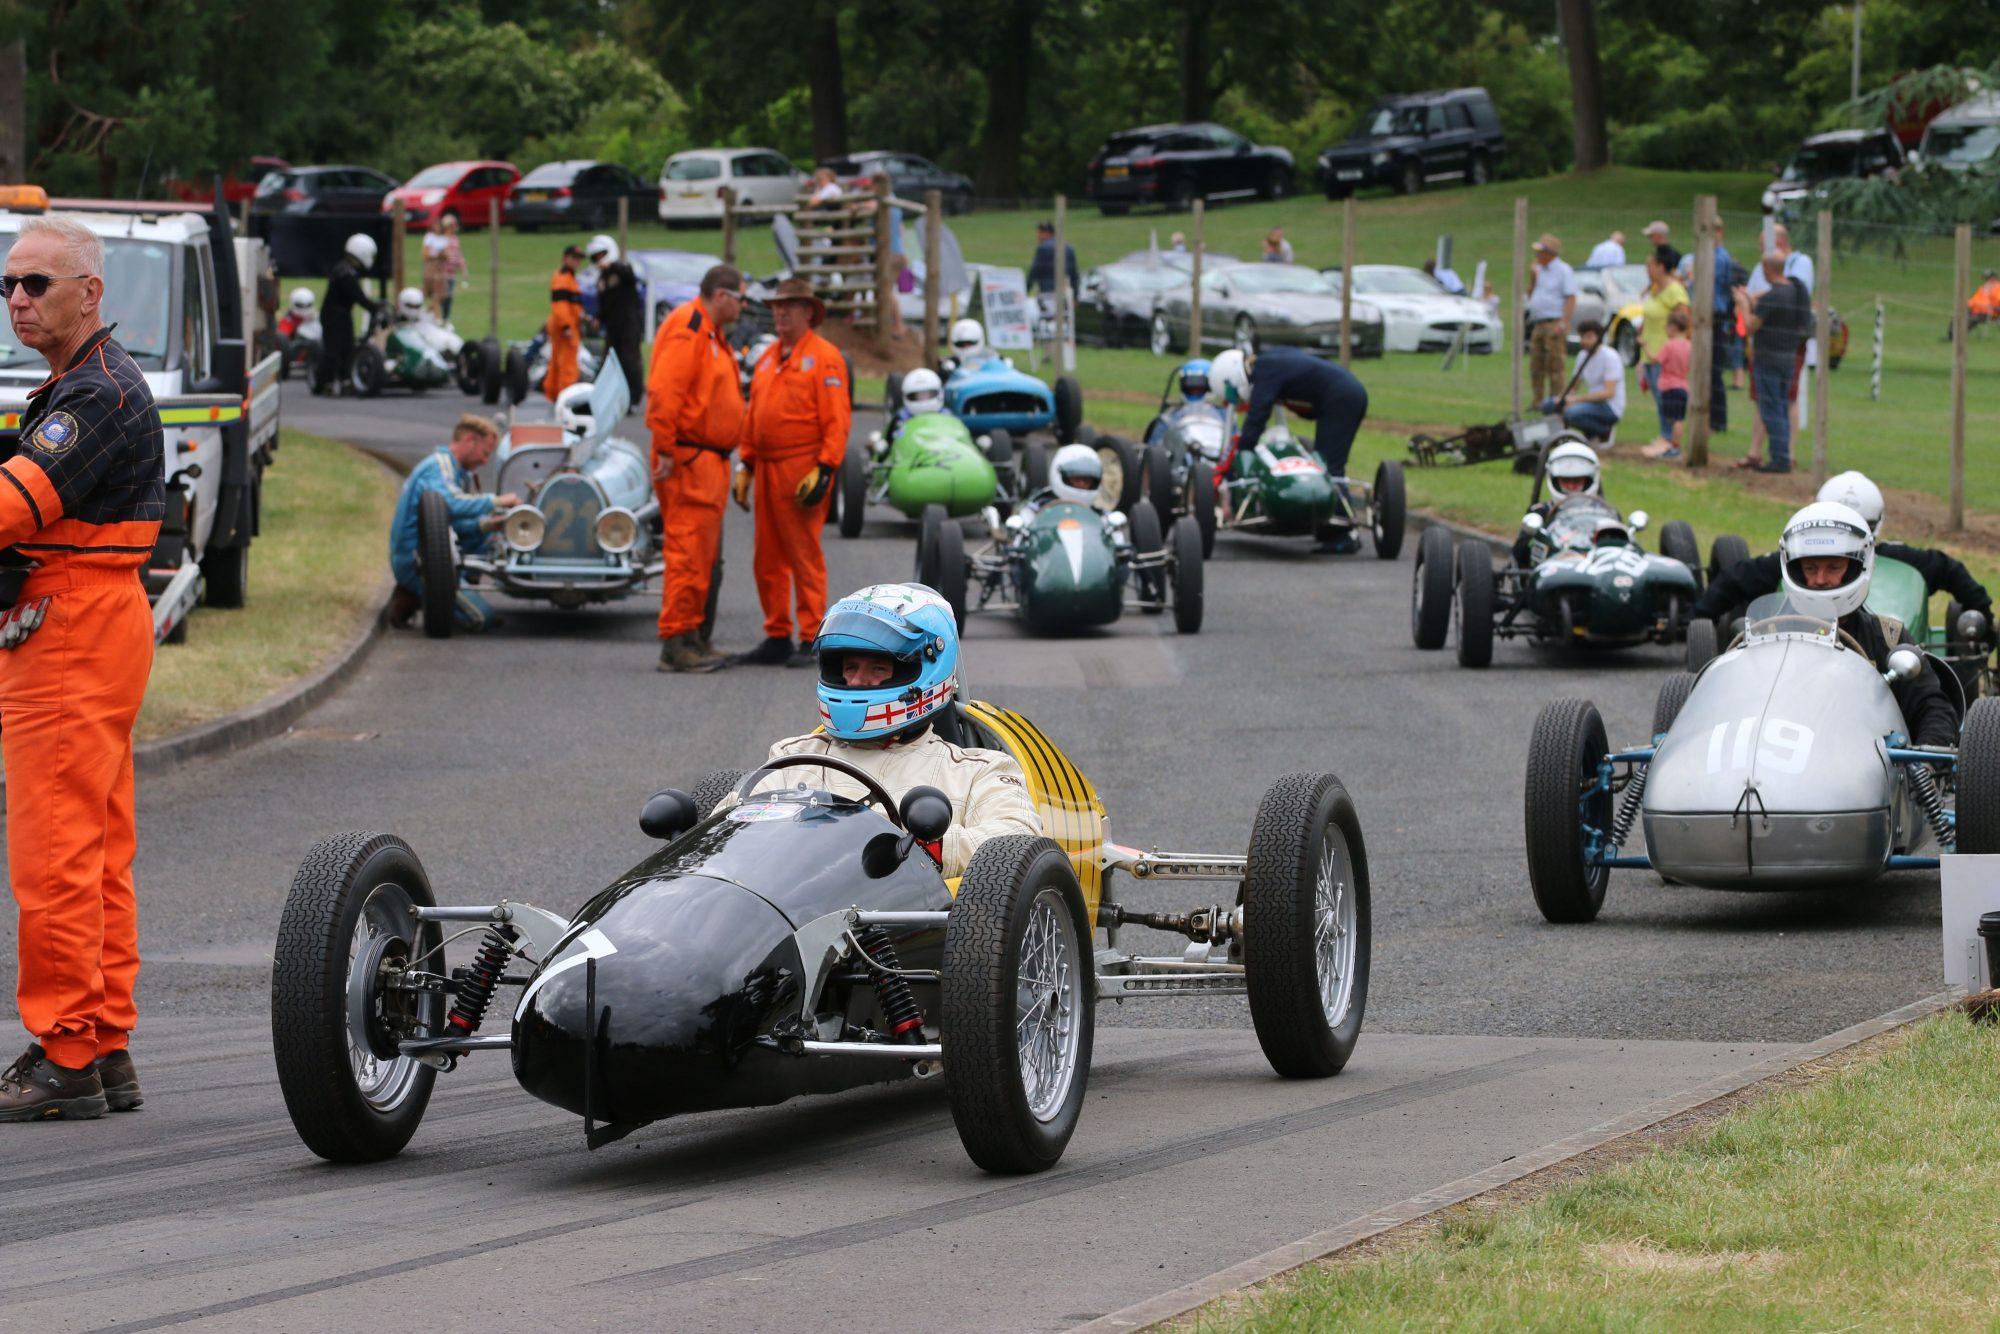 Chateau Impney, hillclimb, hill climb, sprint, motorsport, classic motorsport, Impney